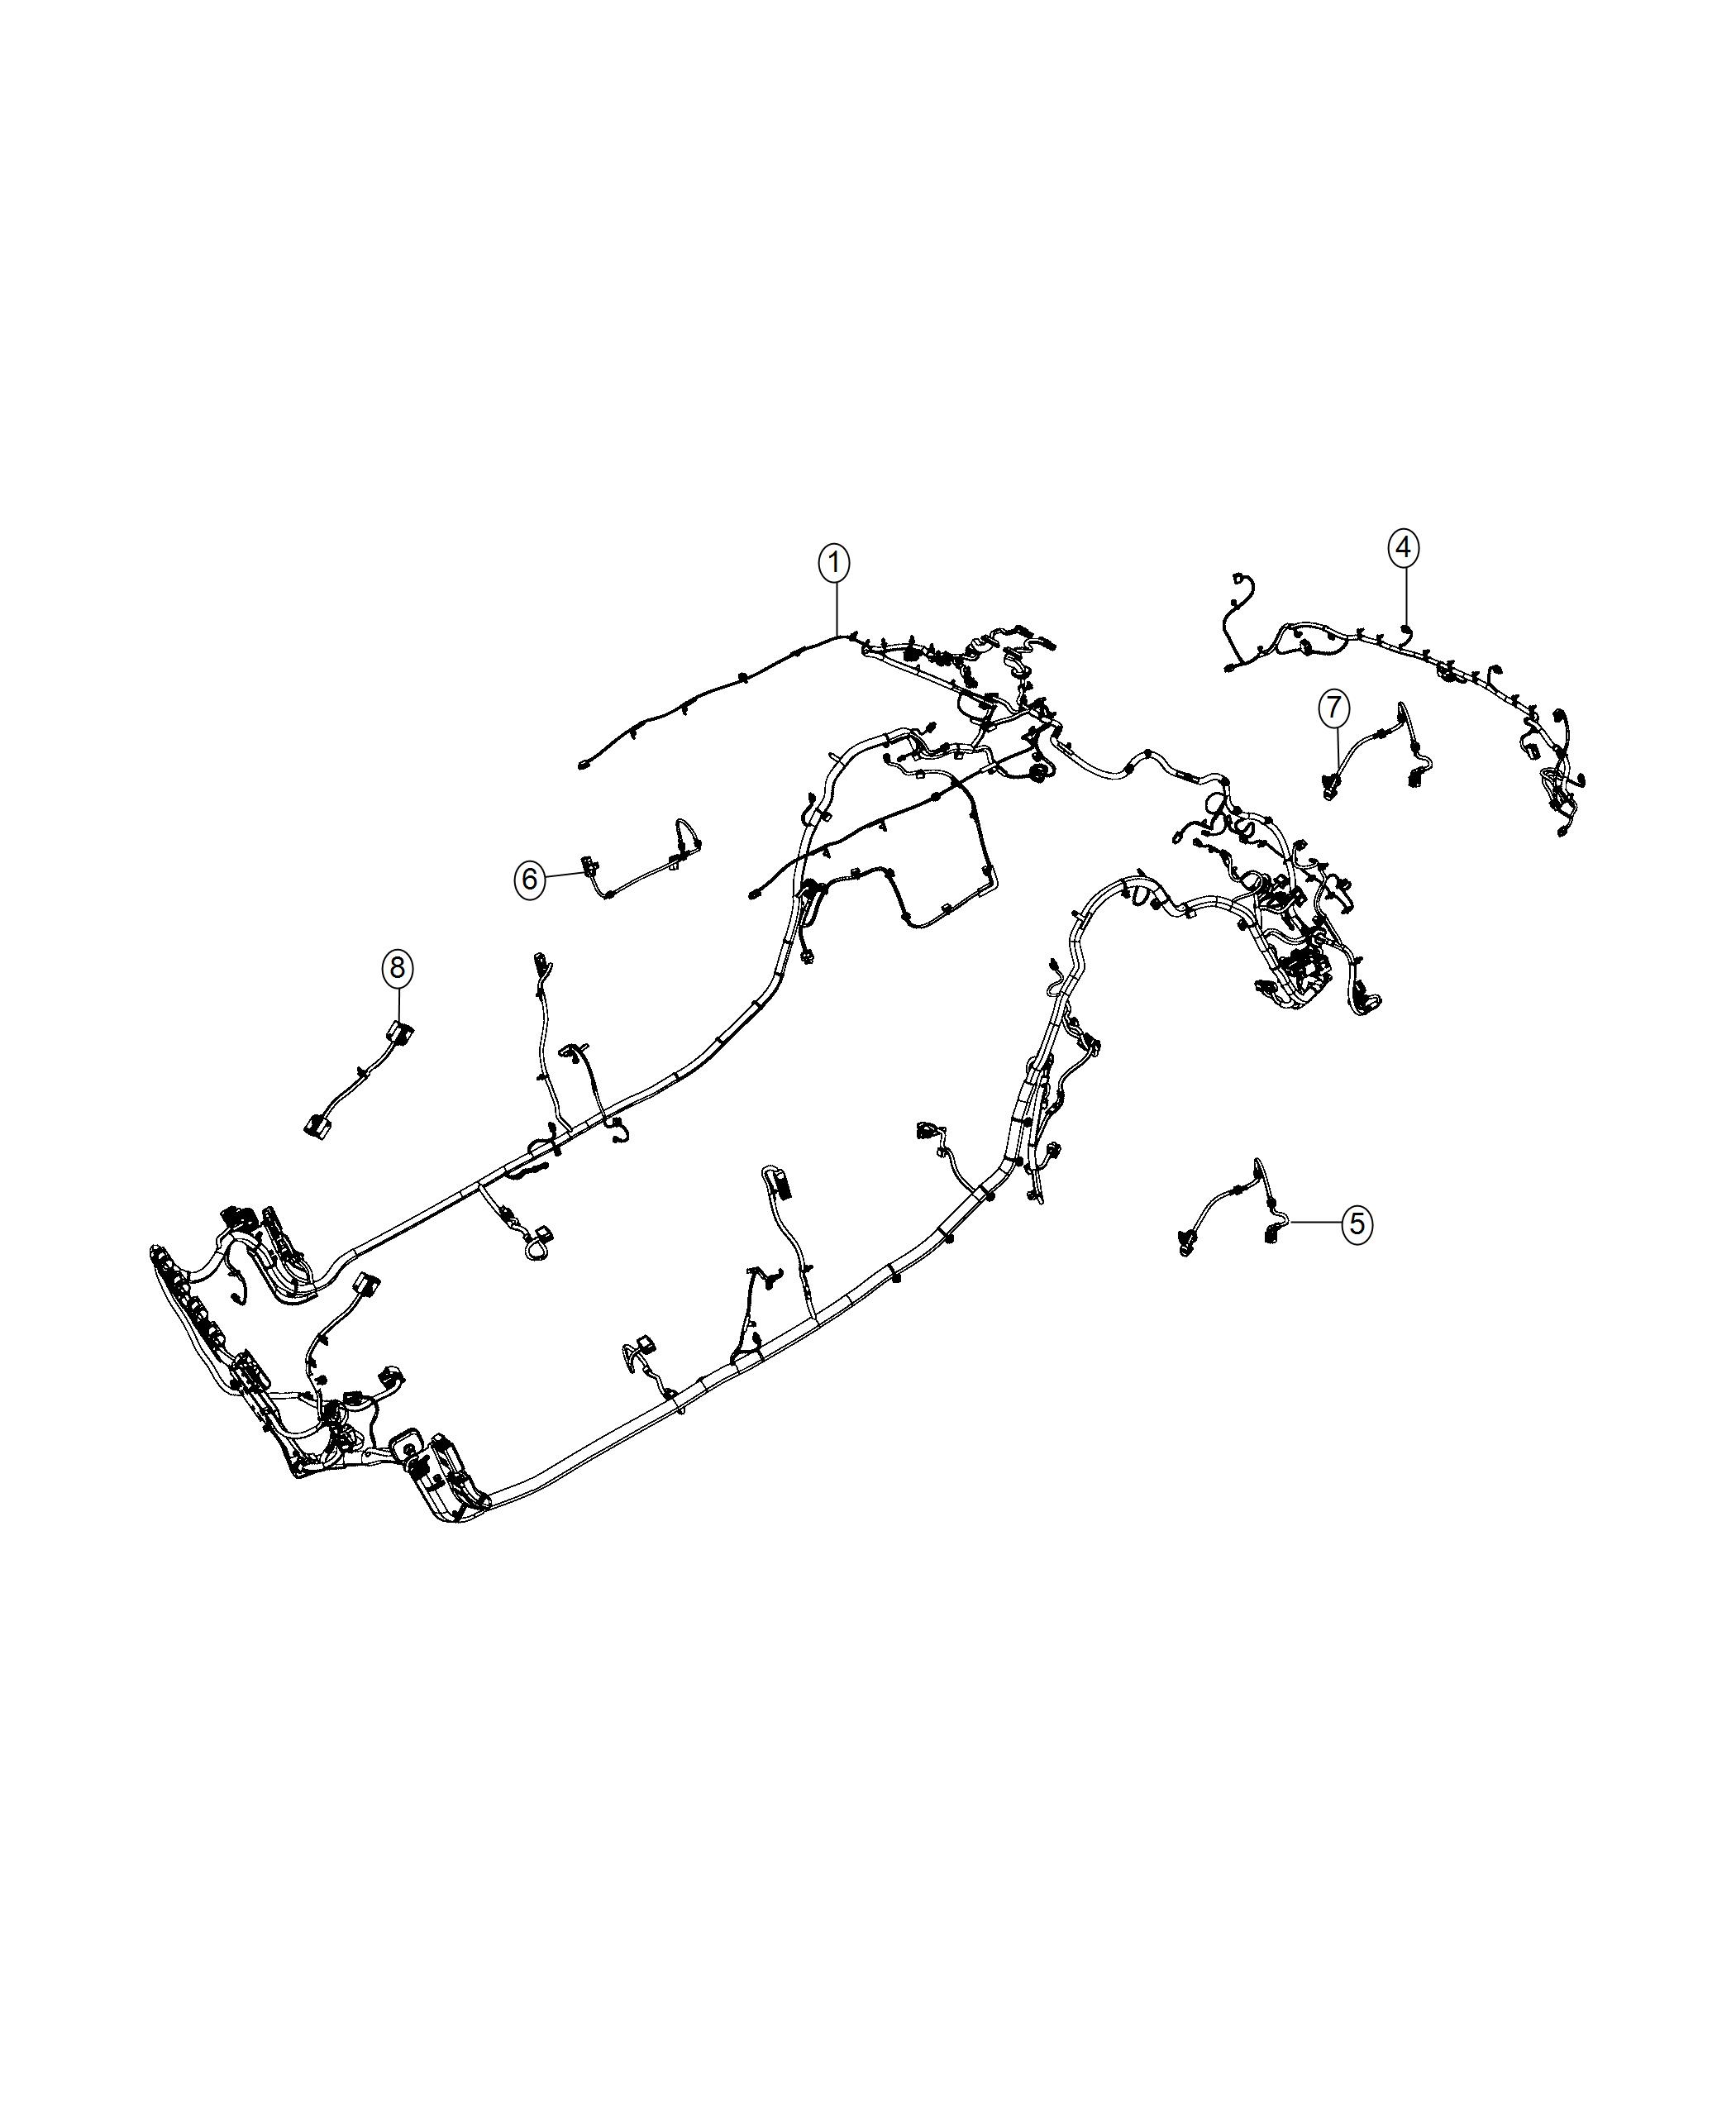 2017 Jeep Renegade Wiring. Trailer tow. Export. [gooseneck